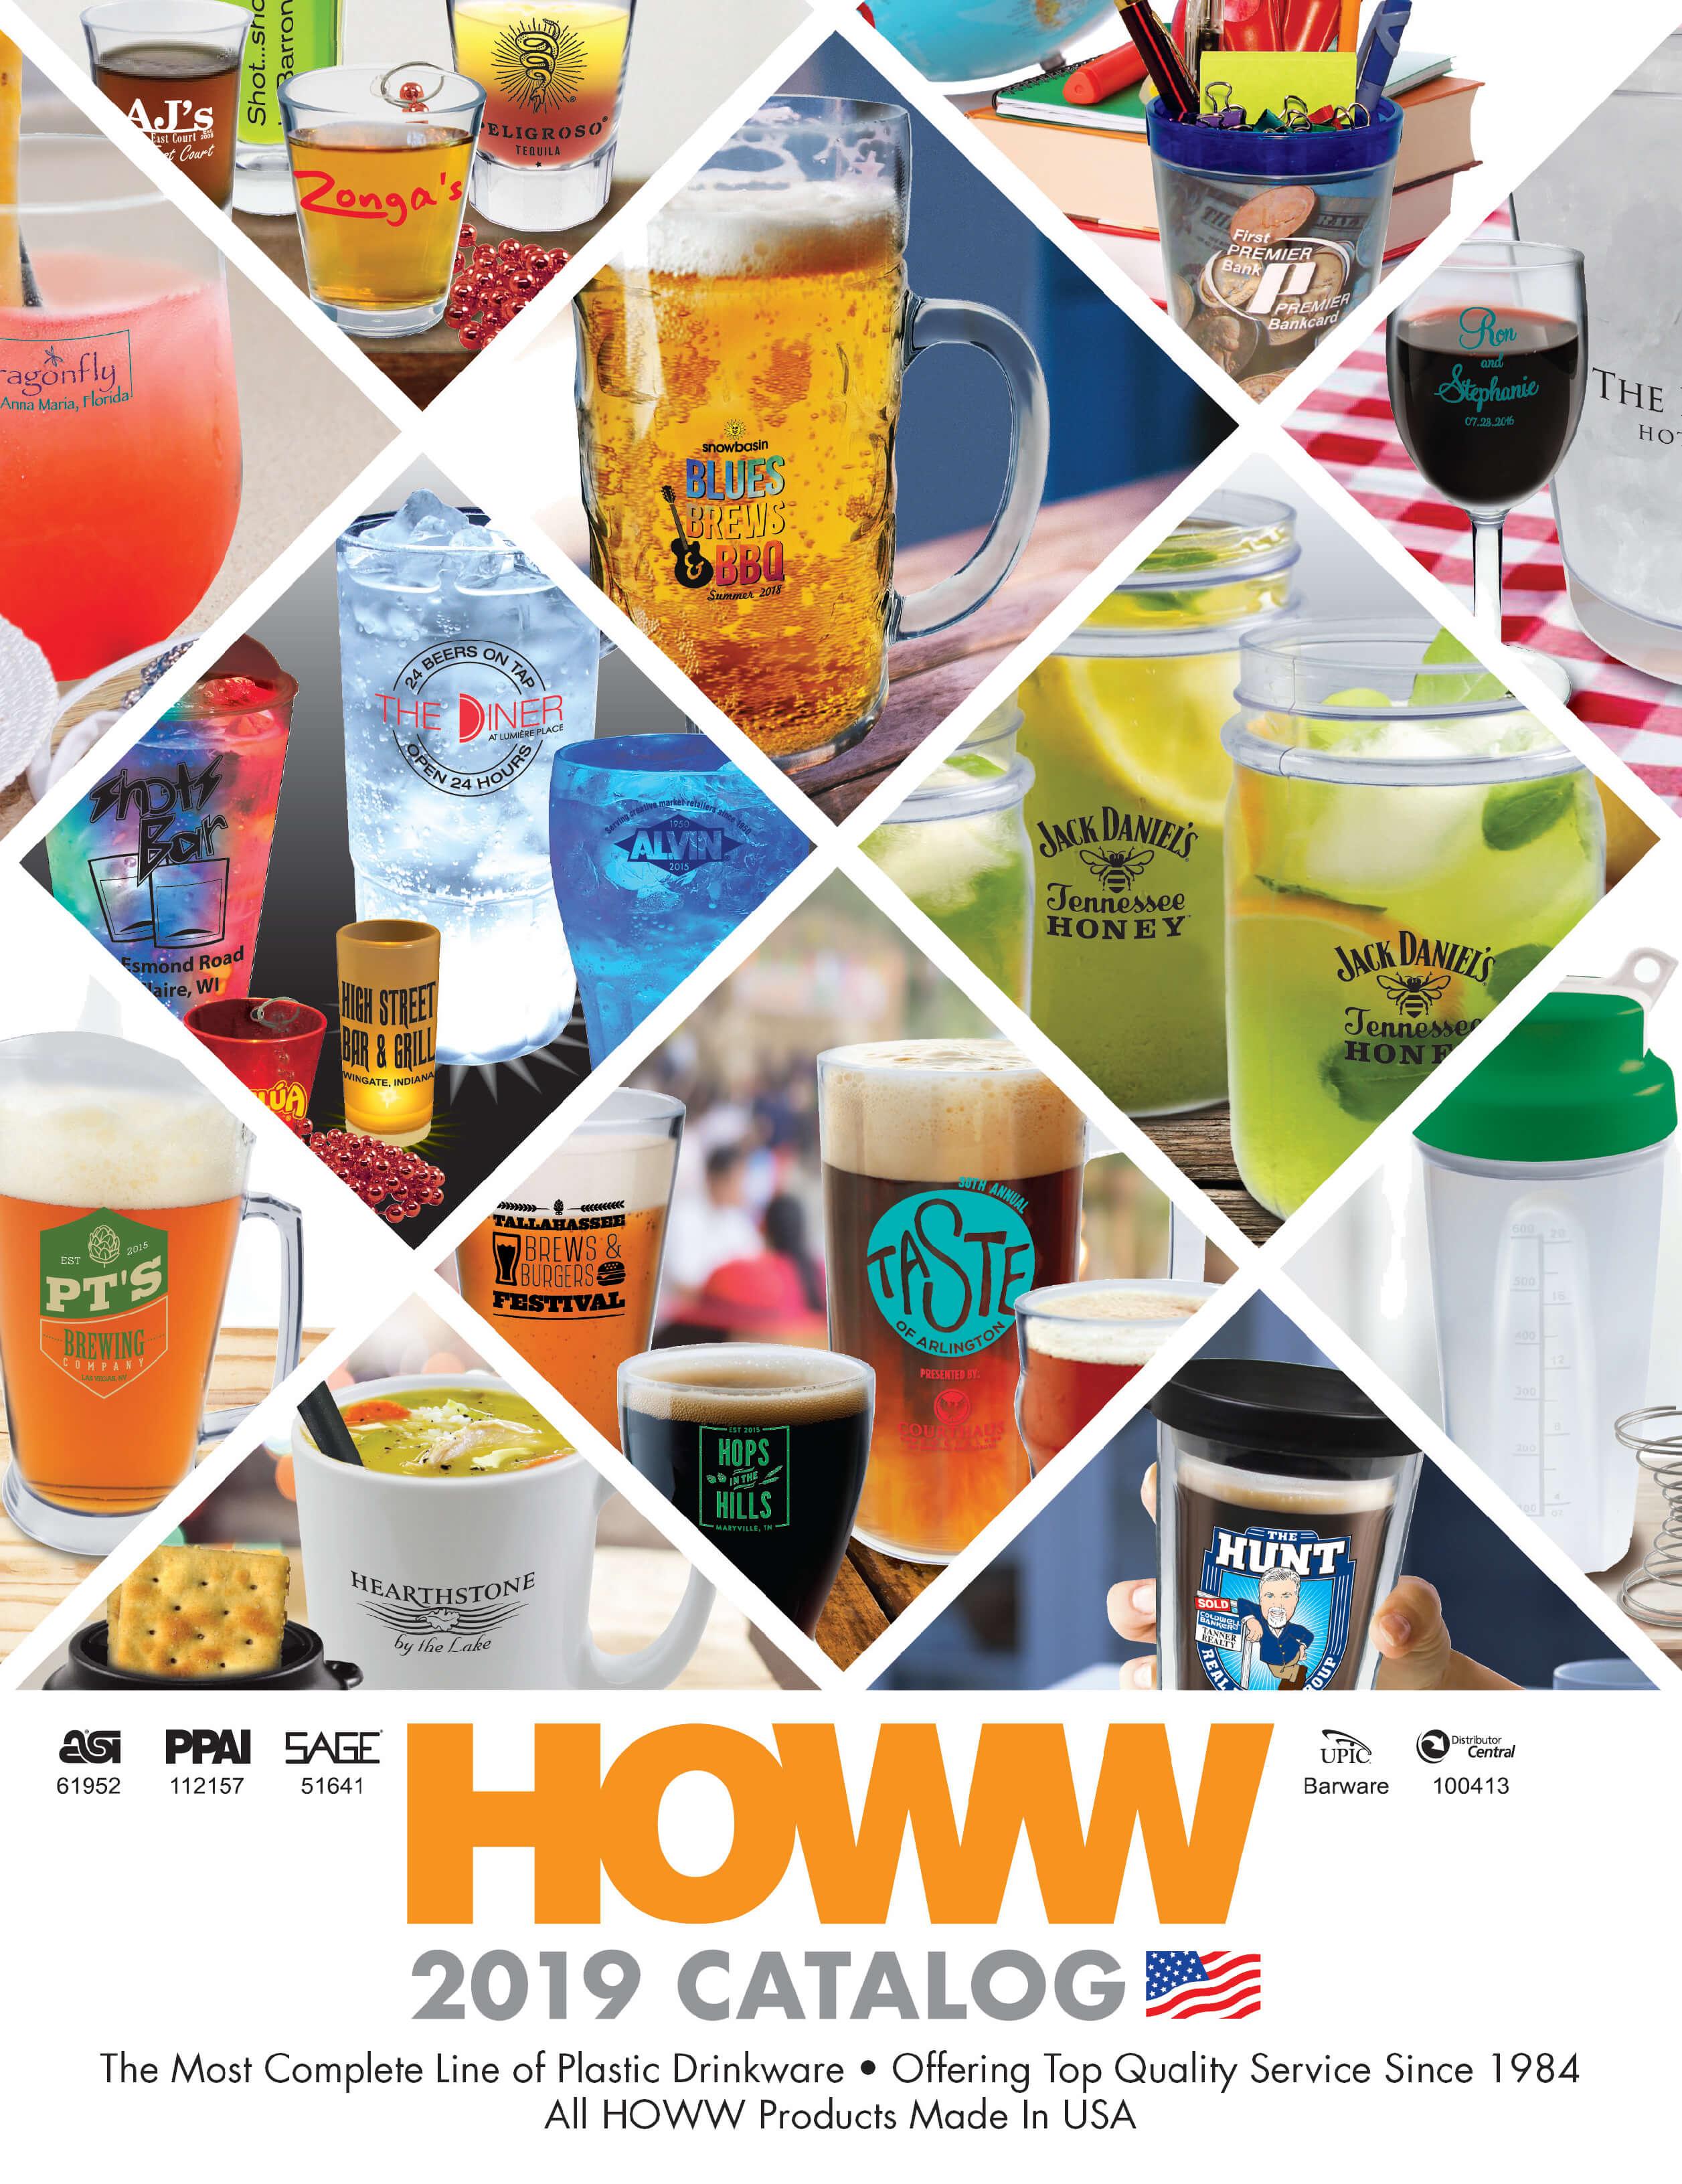 Howw 2019 Catalog